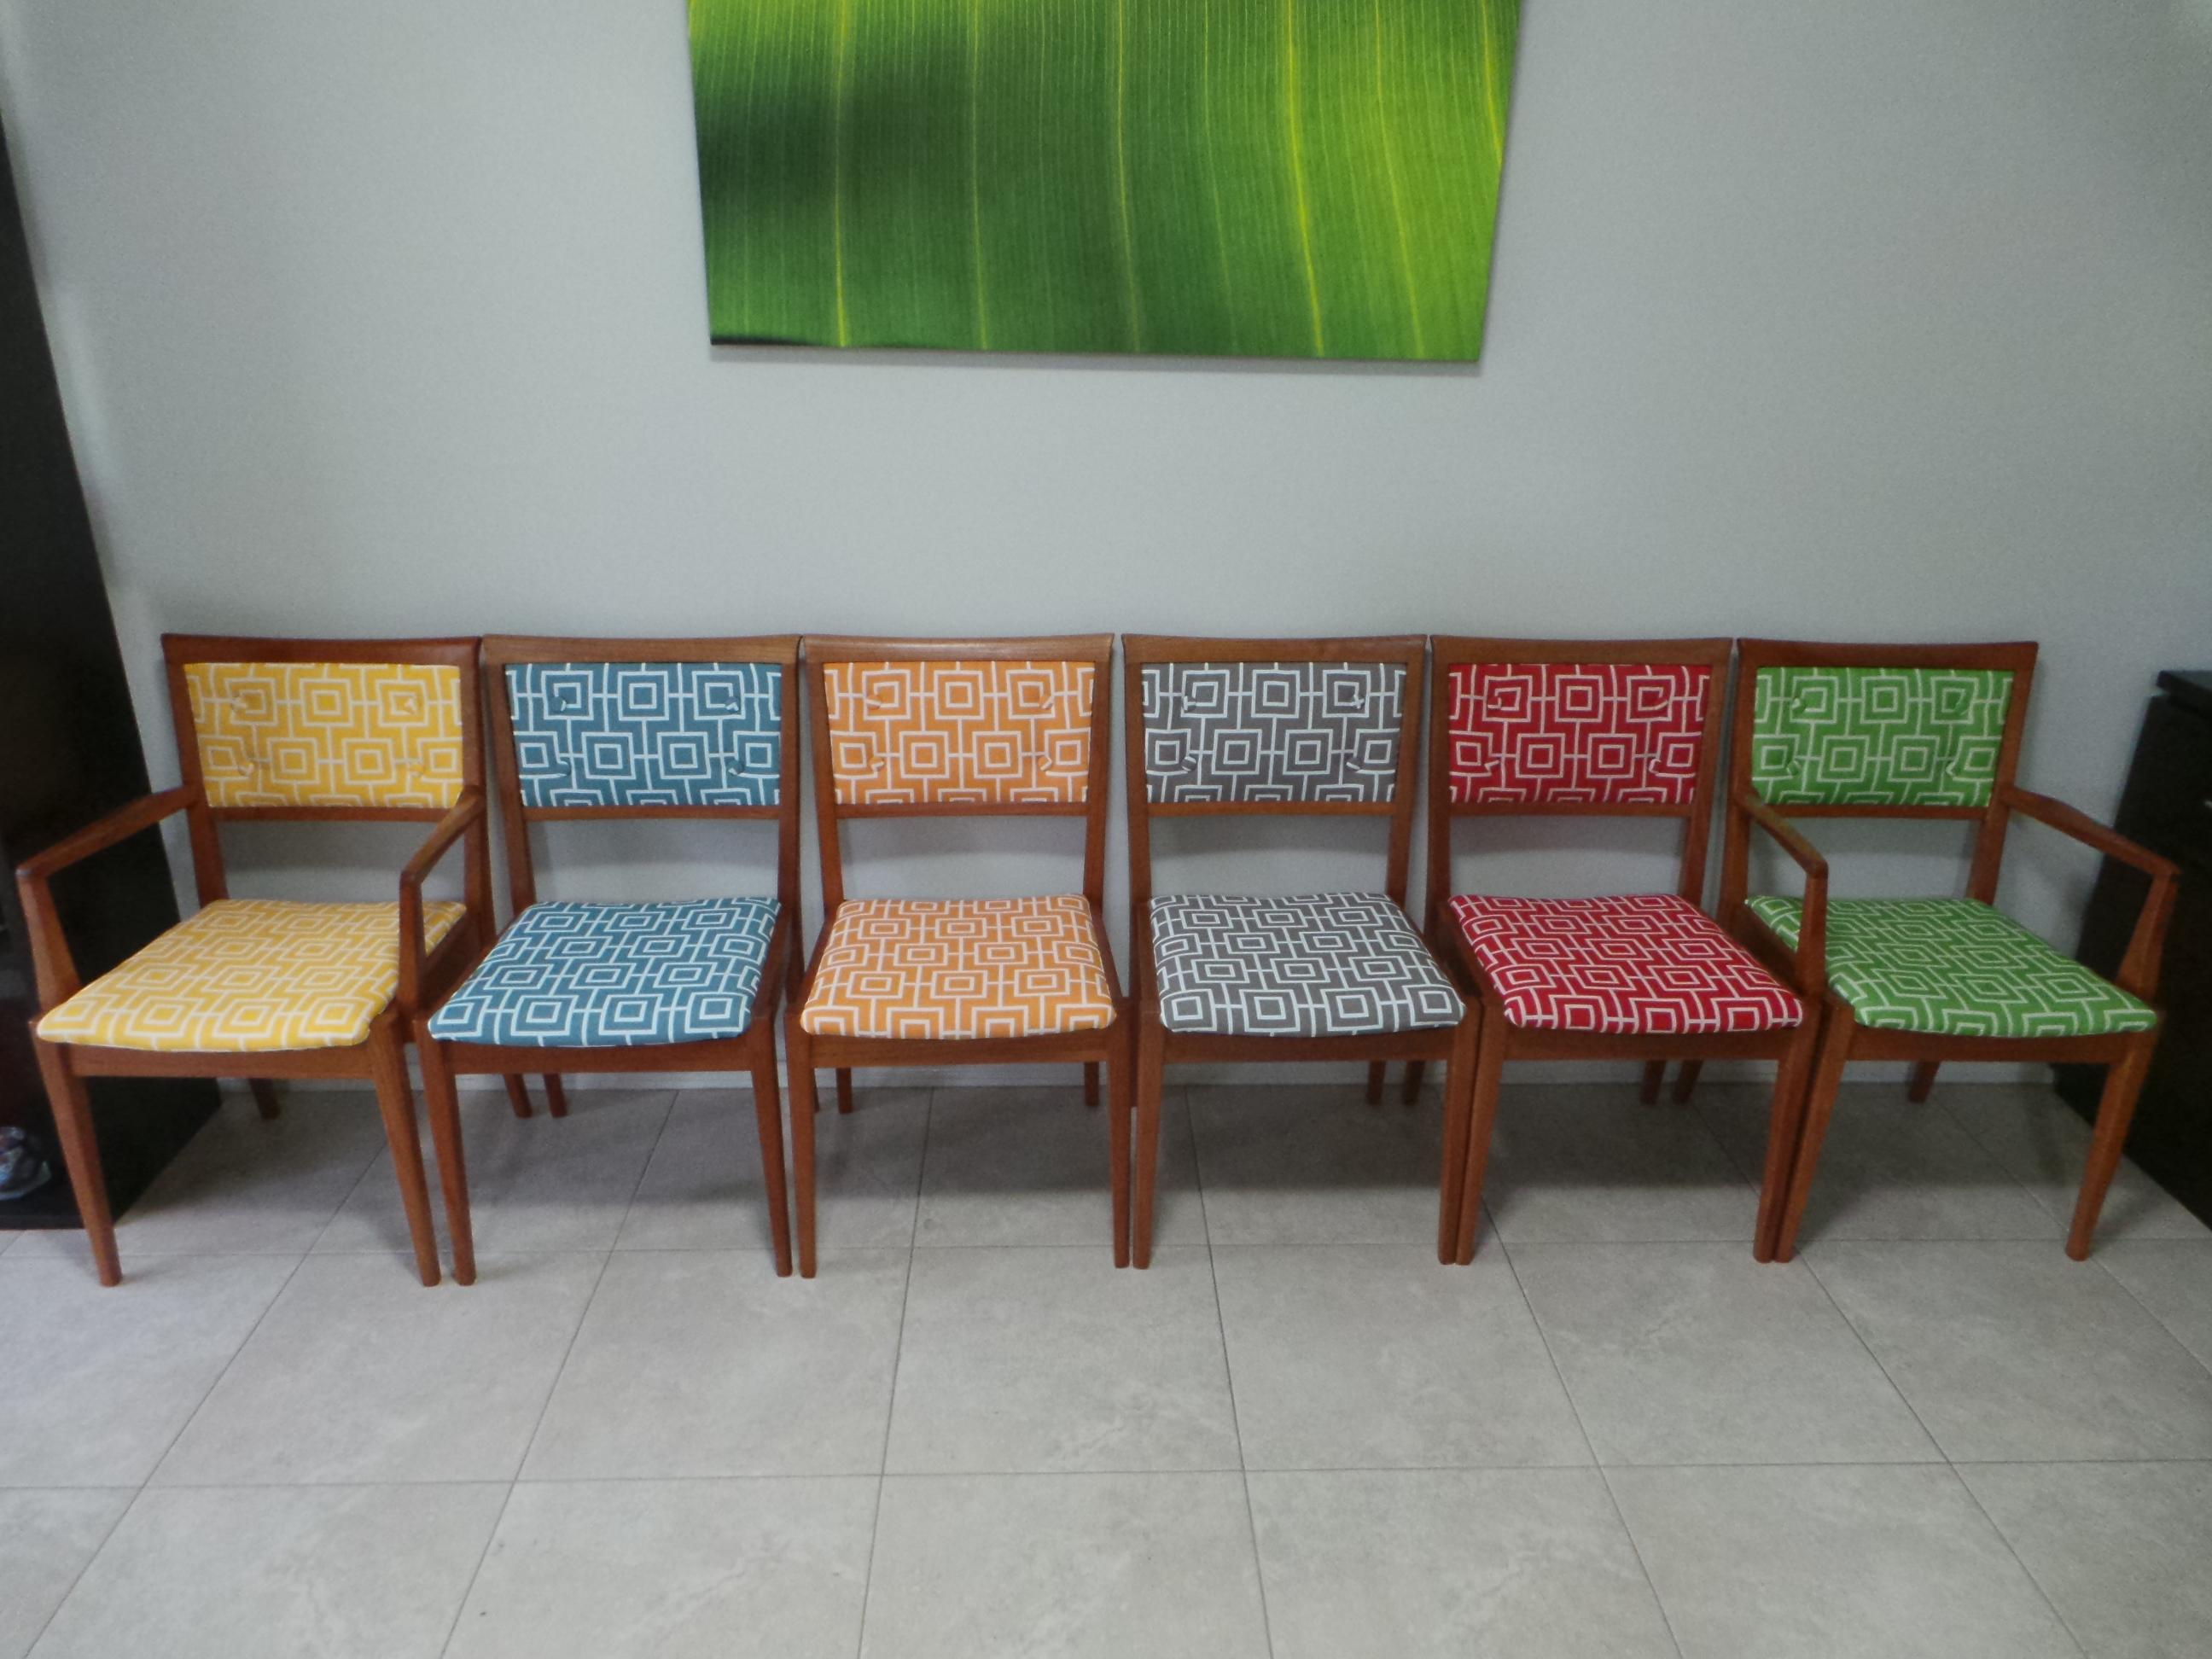 Parker chairs in Bondi fabric